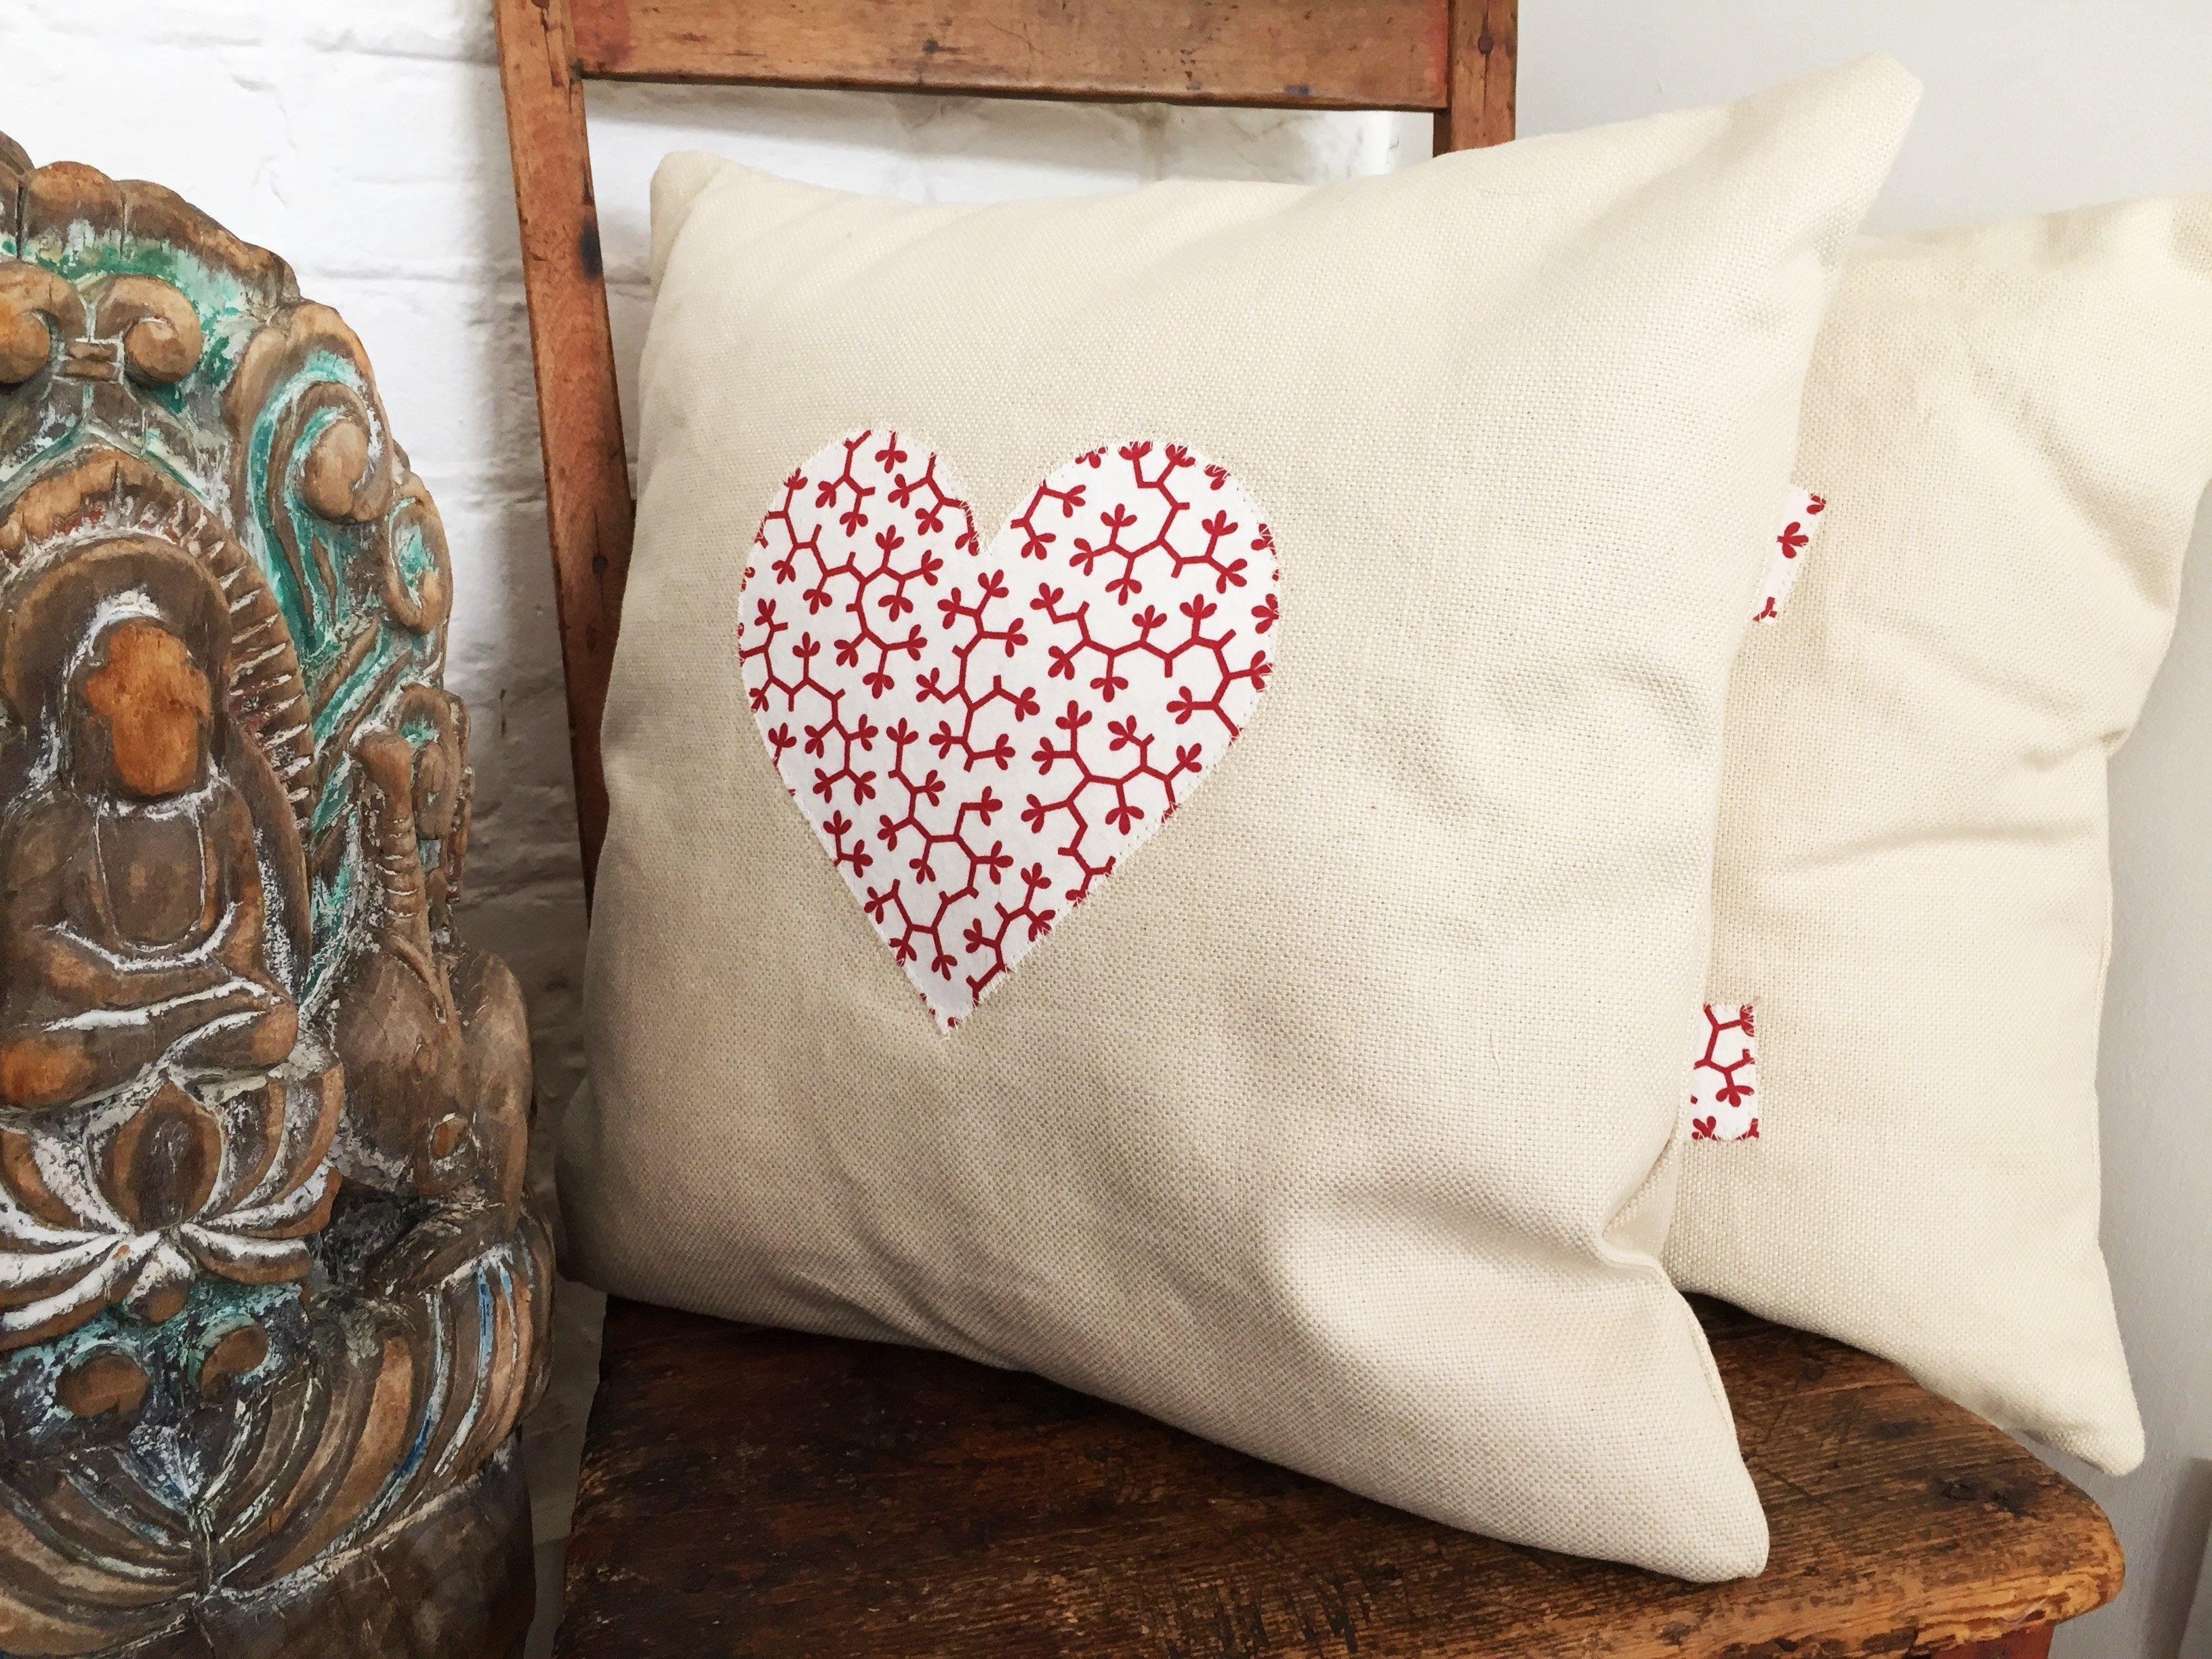 Beautiful cushion handmade with ian mankin fabric stitched heart